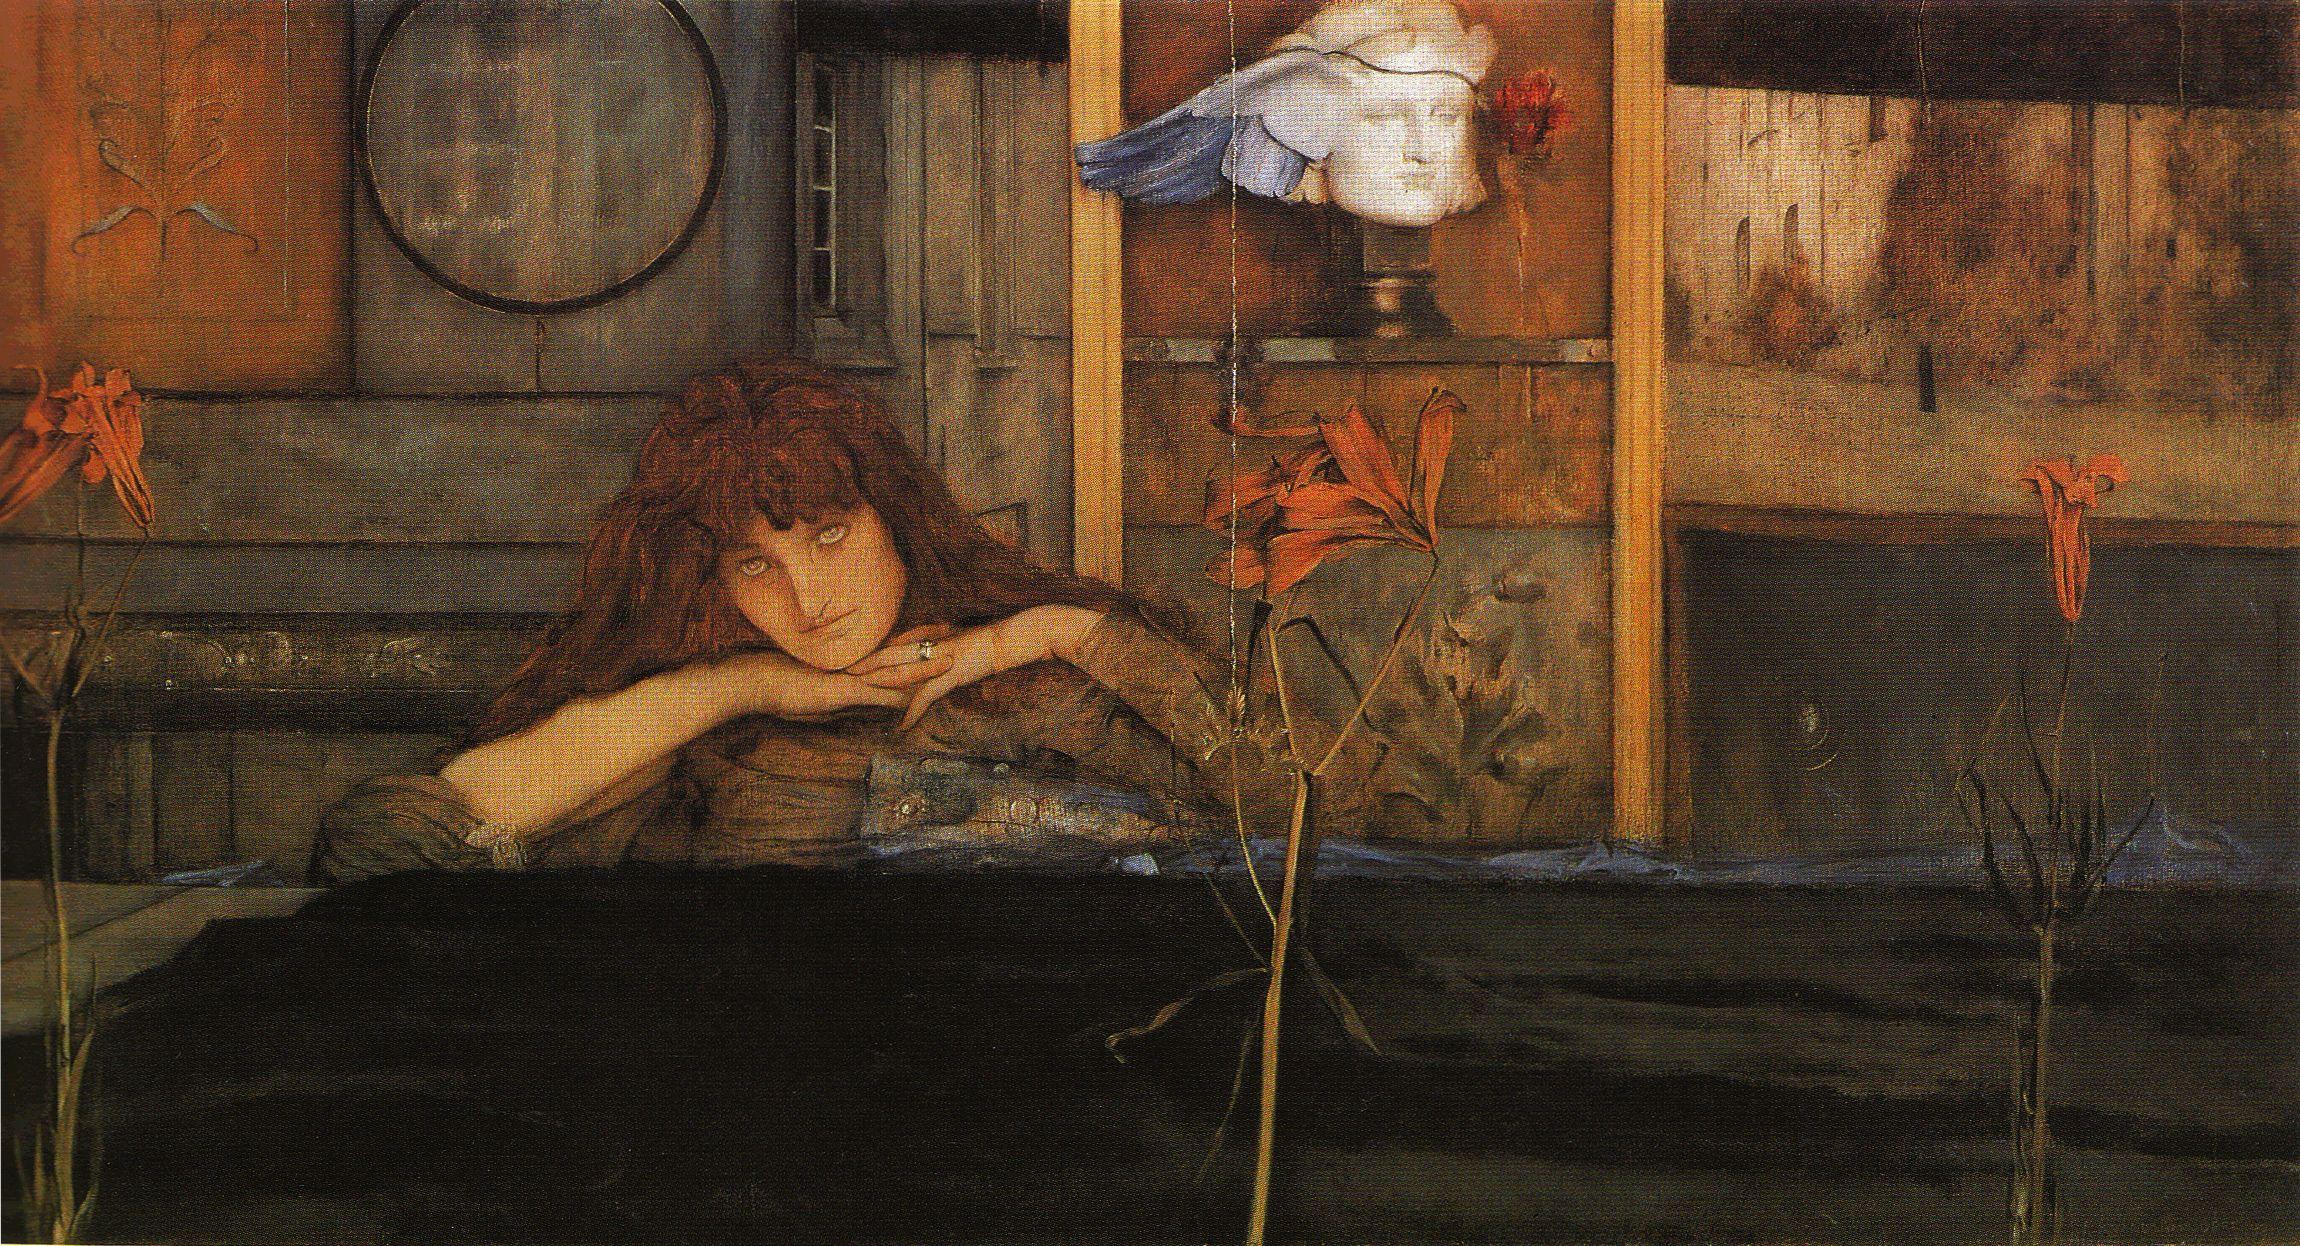 Fernand Khnopff, I lock my door upon myself, 1891